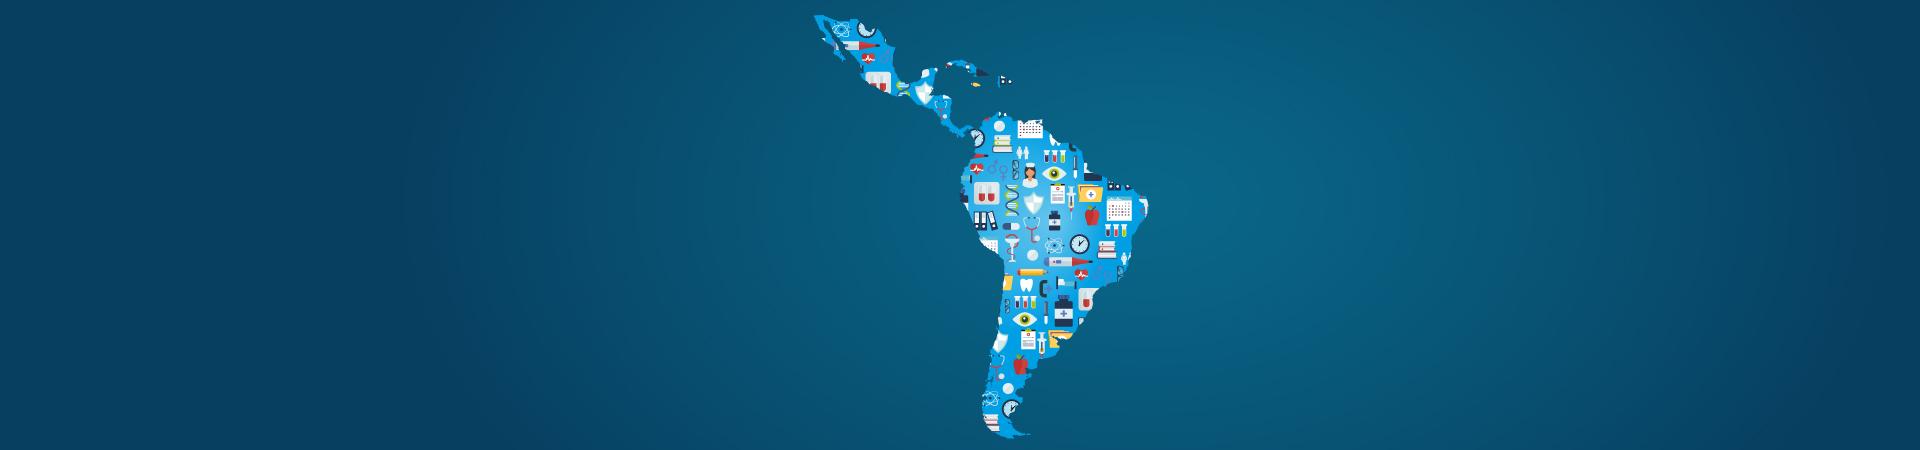 Latin American health systems